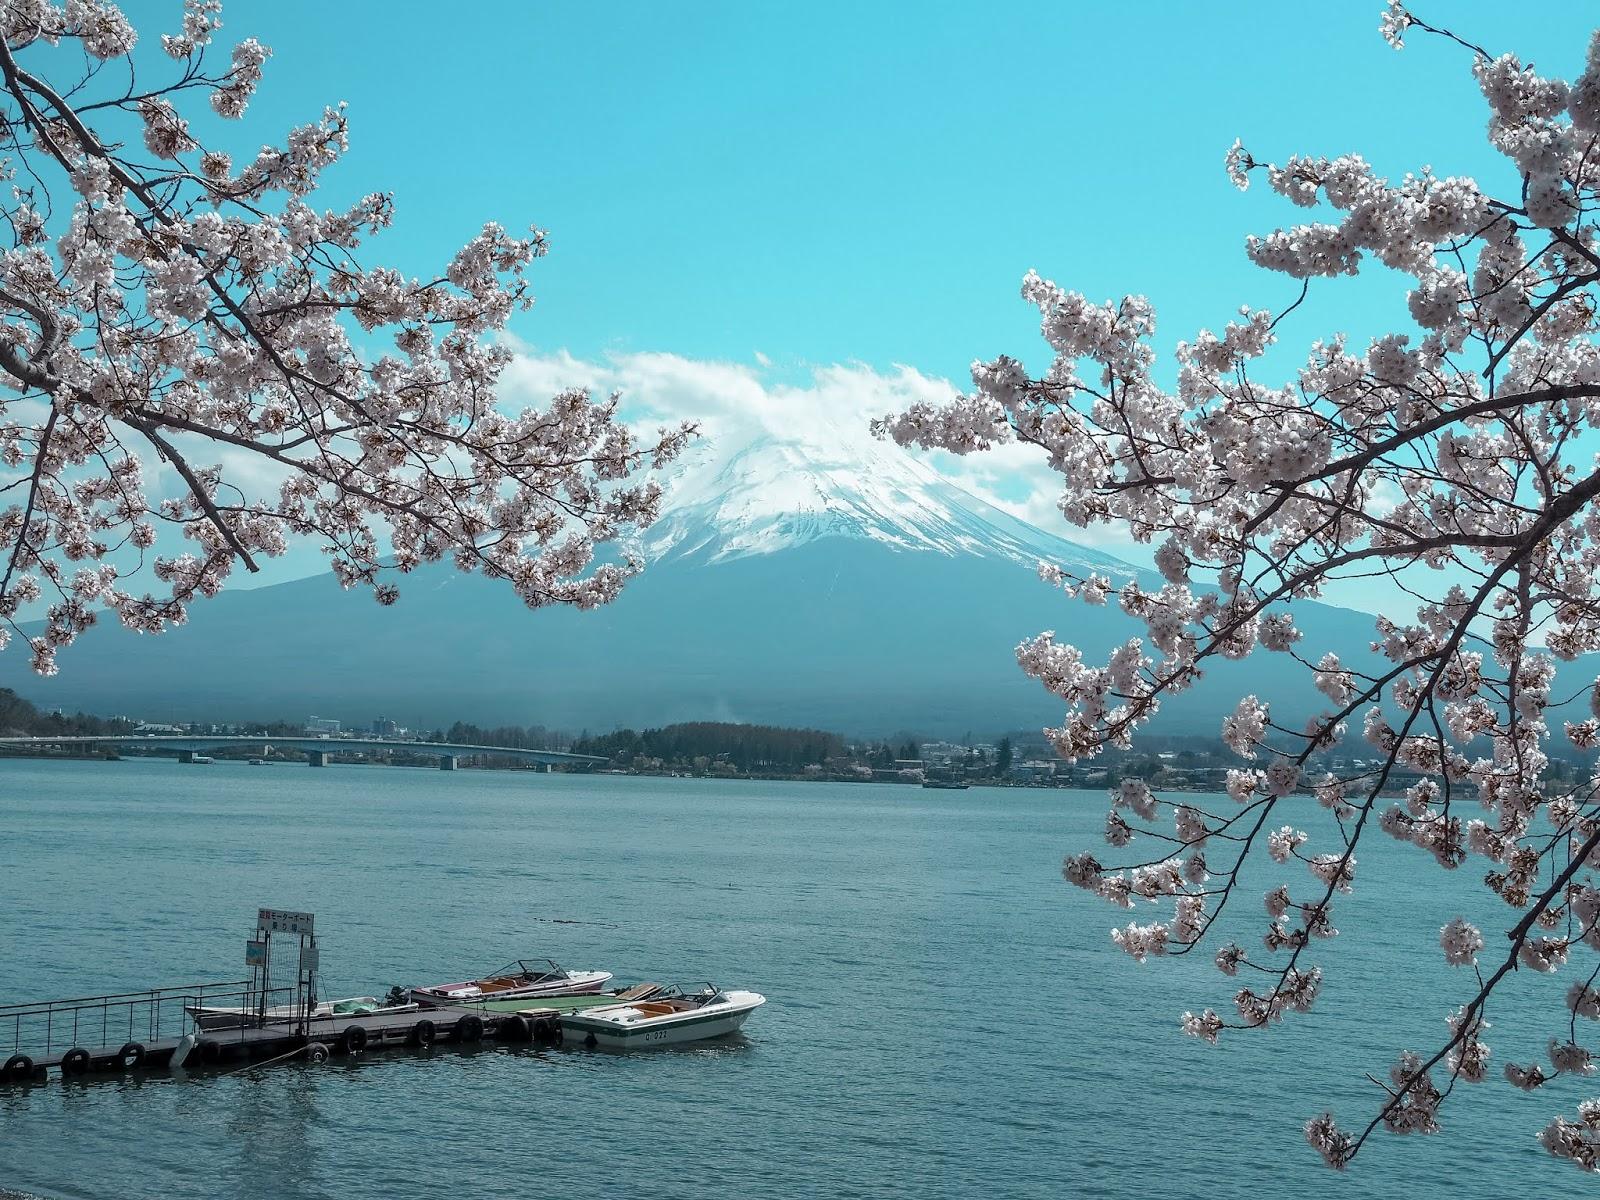 Cherry Blossoms in Lake Kawaguchiko Japan 2018